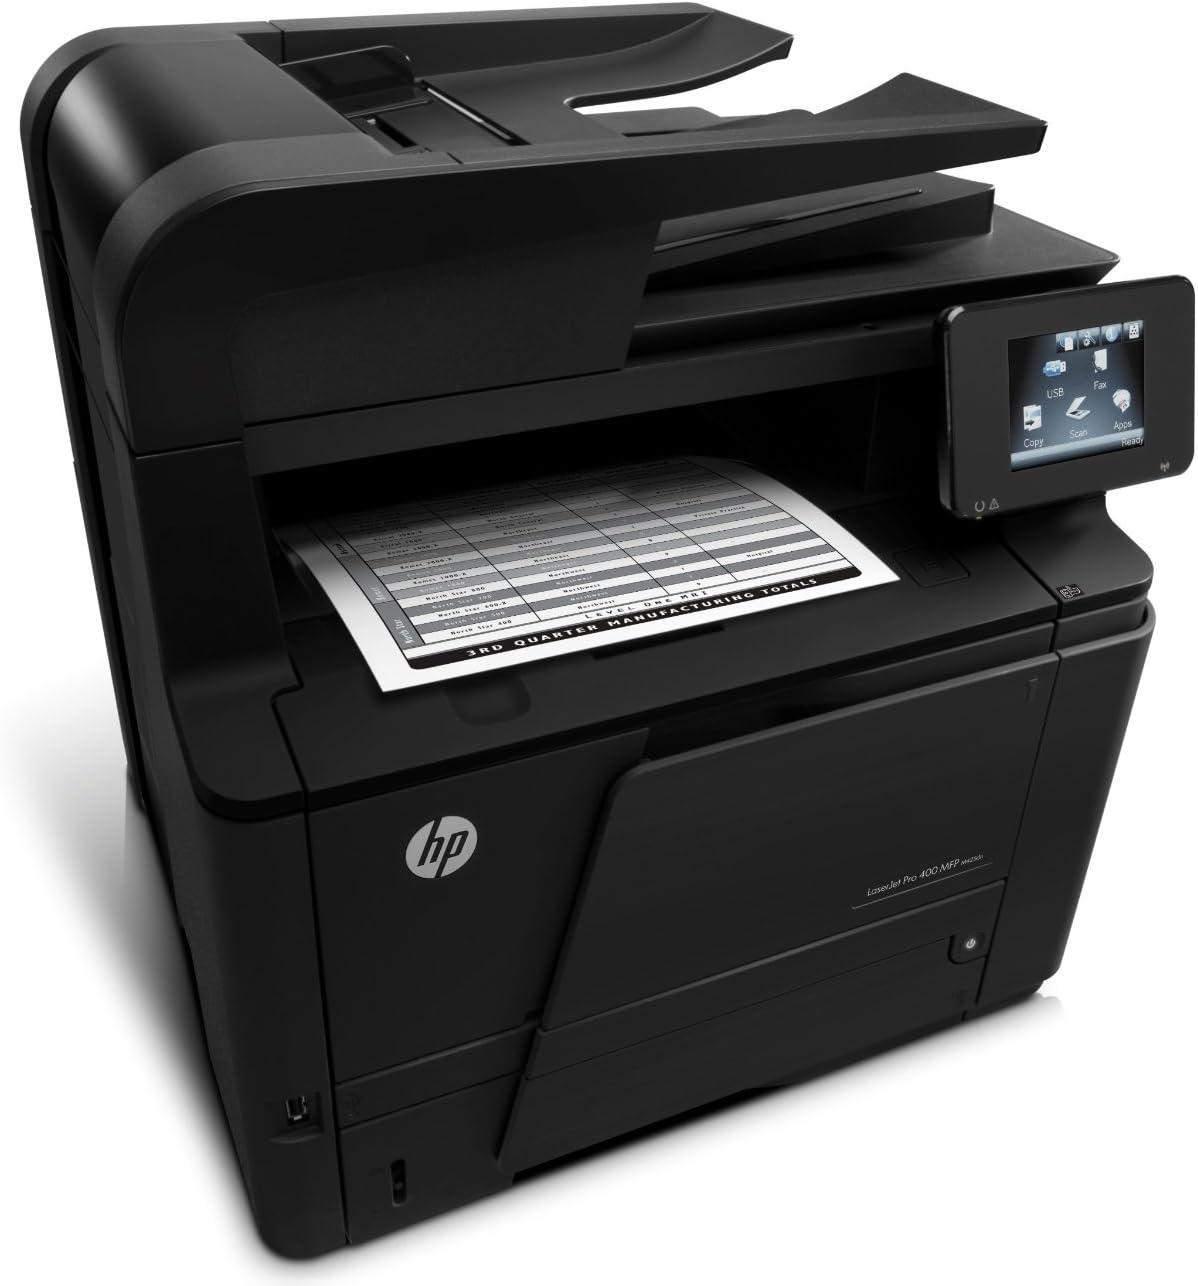 Hp Laserjet Pro 400 Mfp M425dn All In One Computer Zubehör